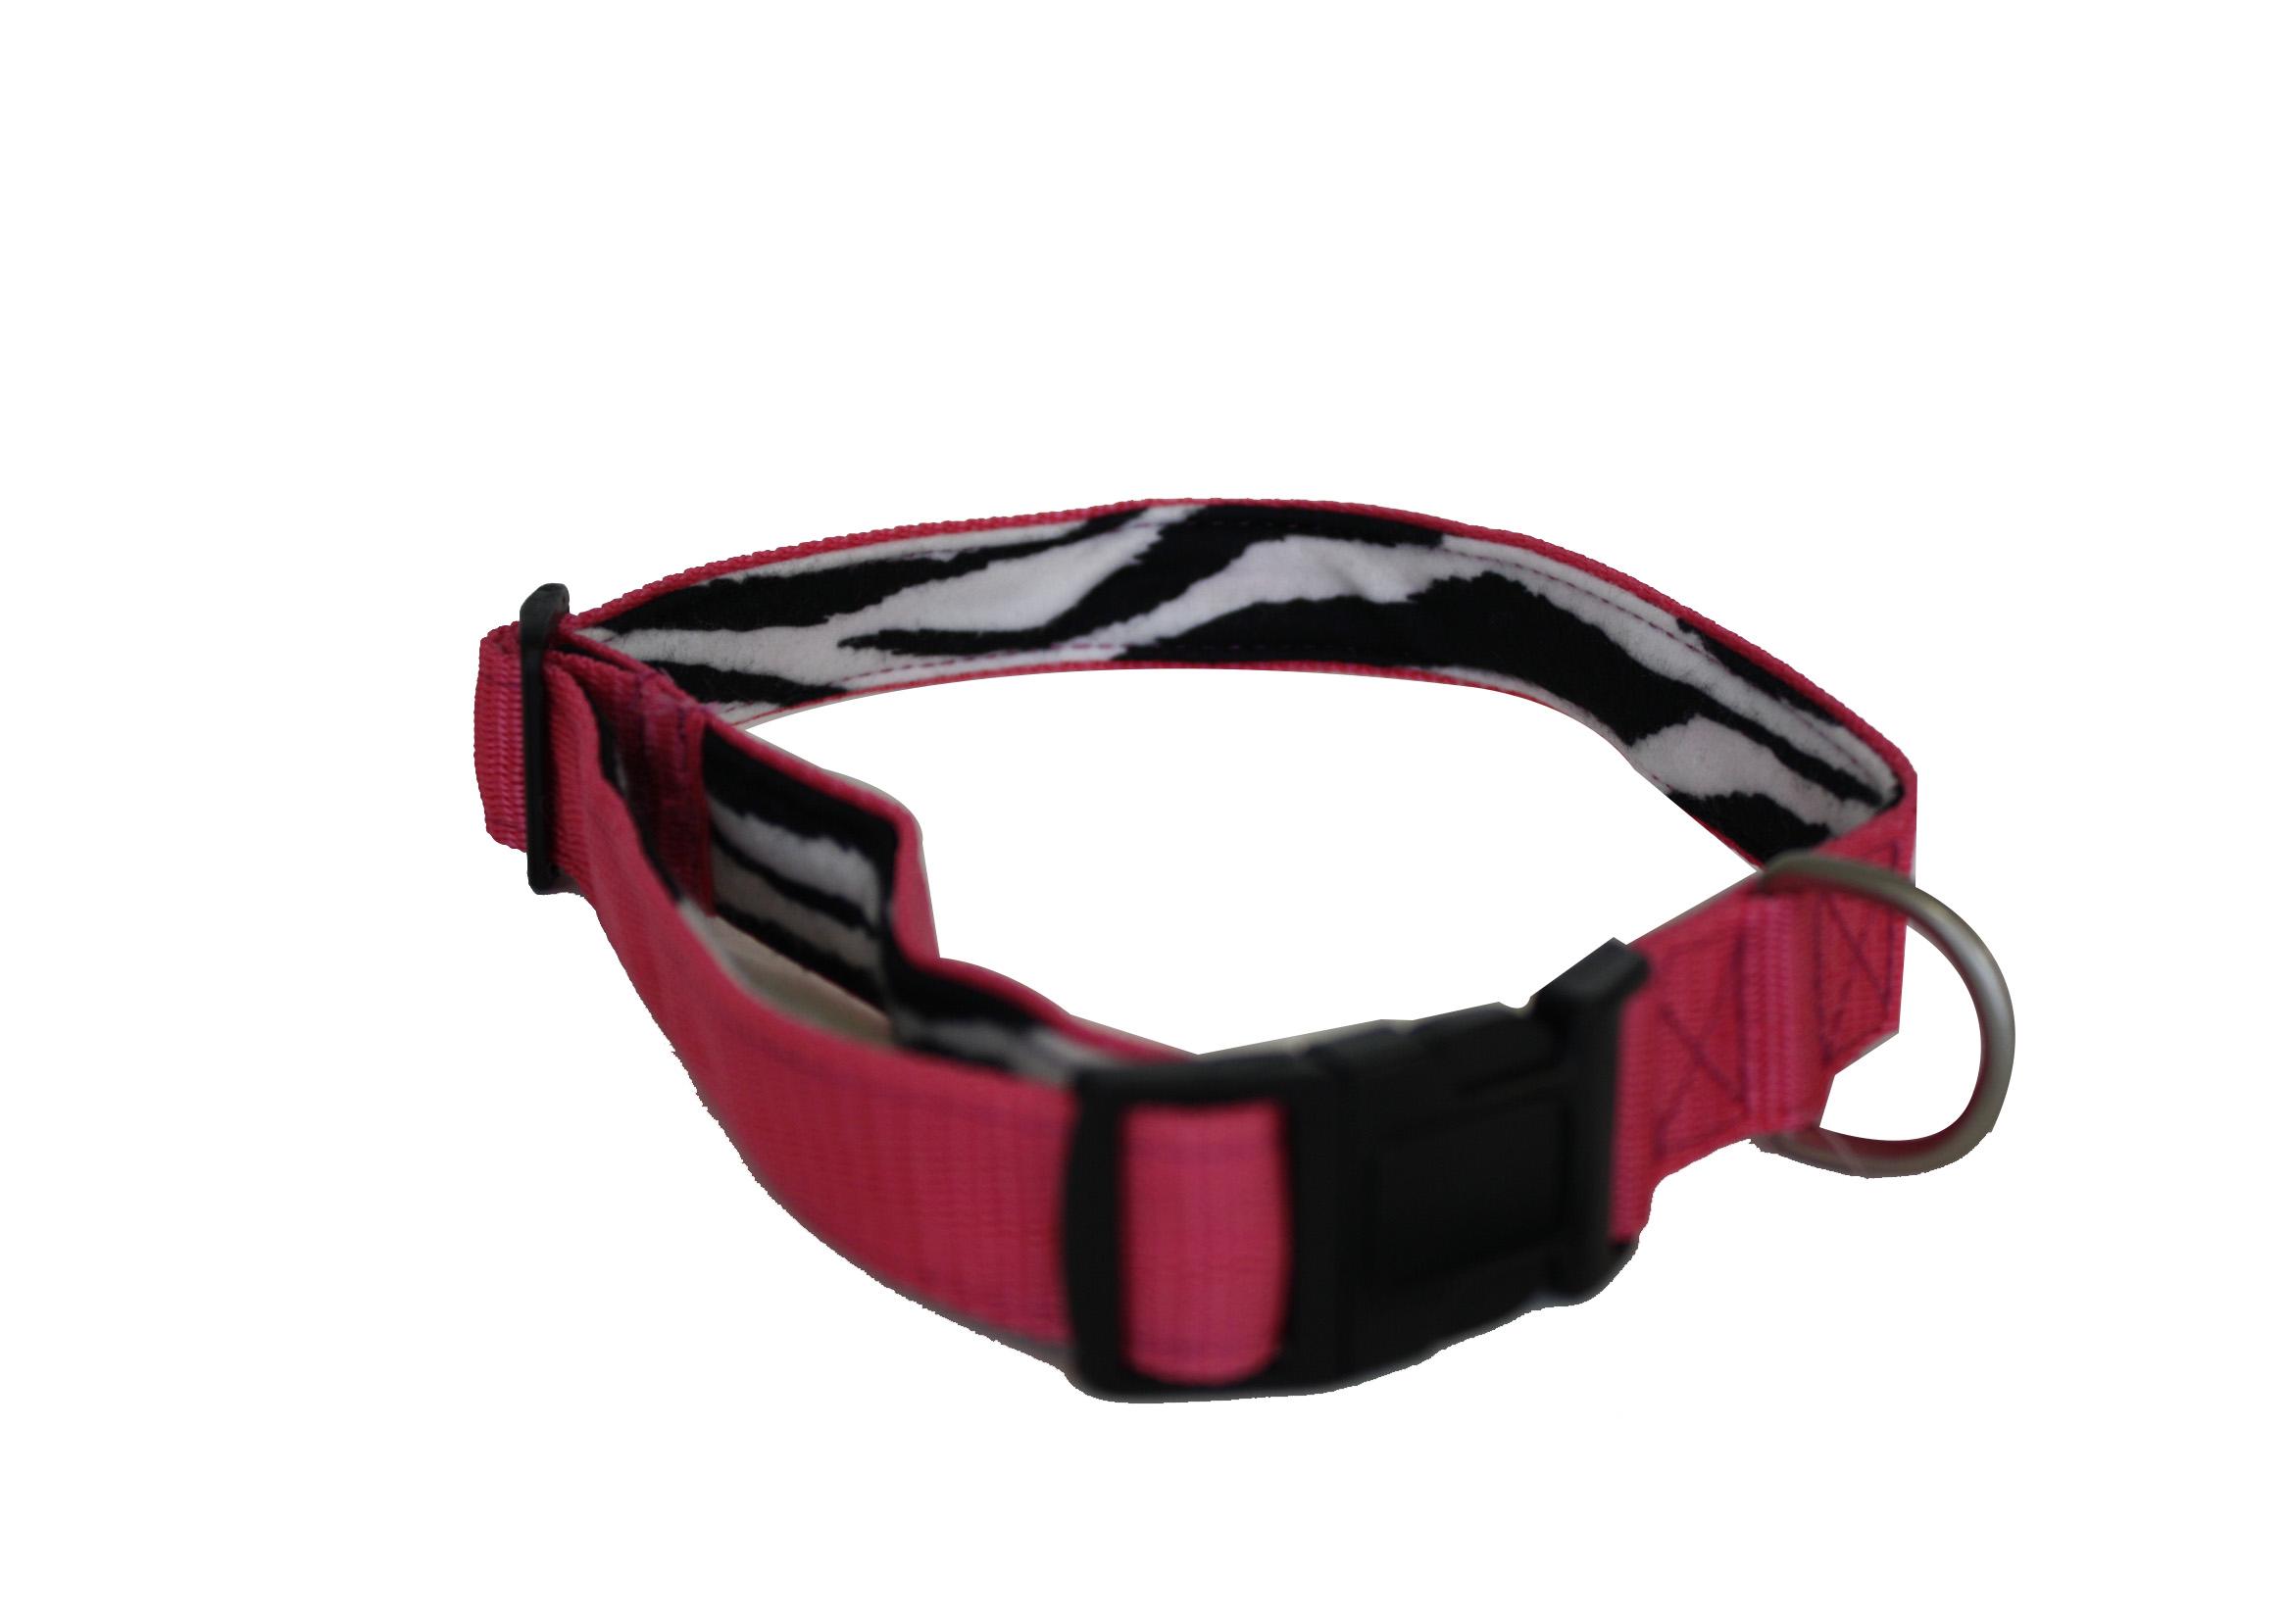 Lami-Cell Fleece Lined Dog Collar